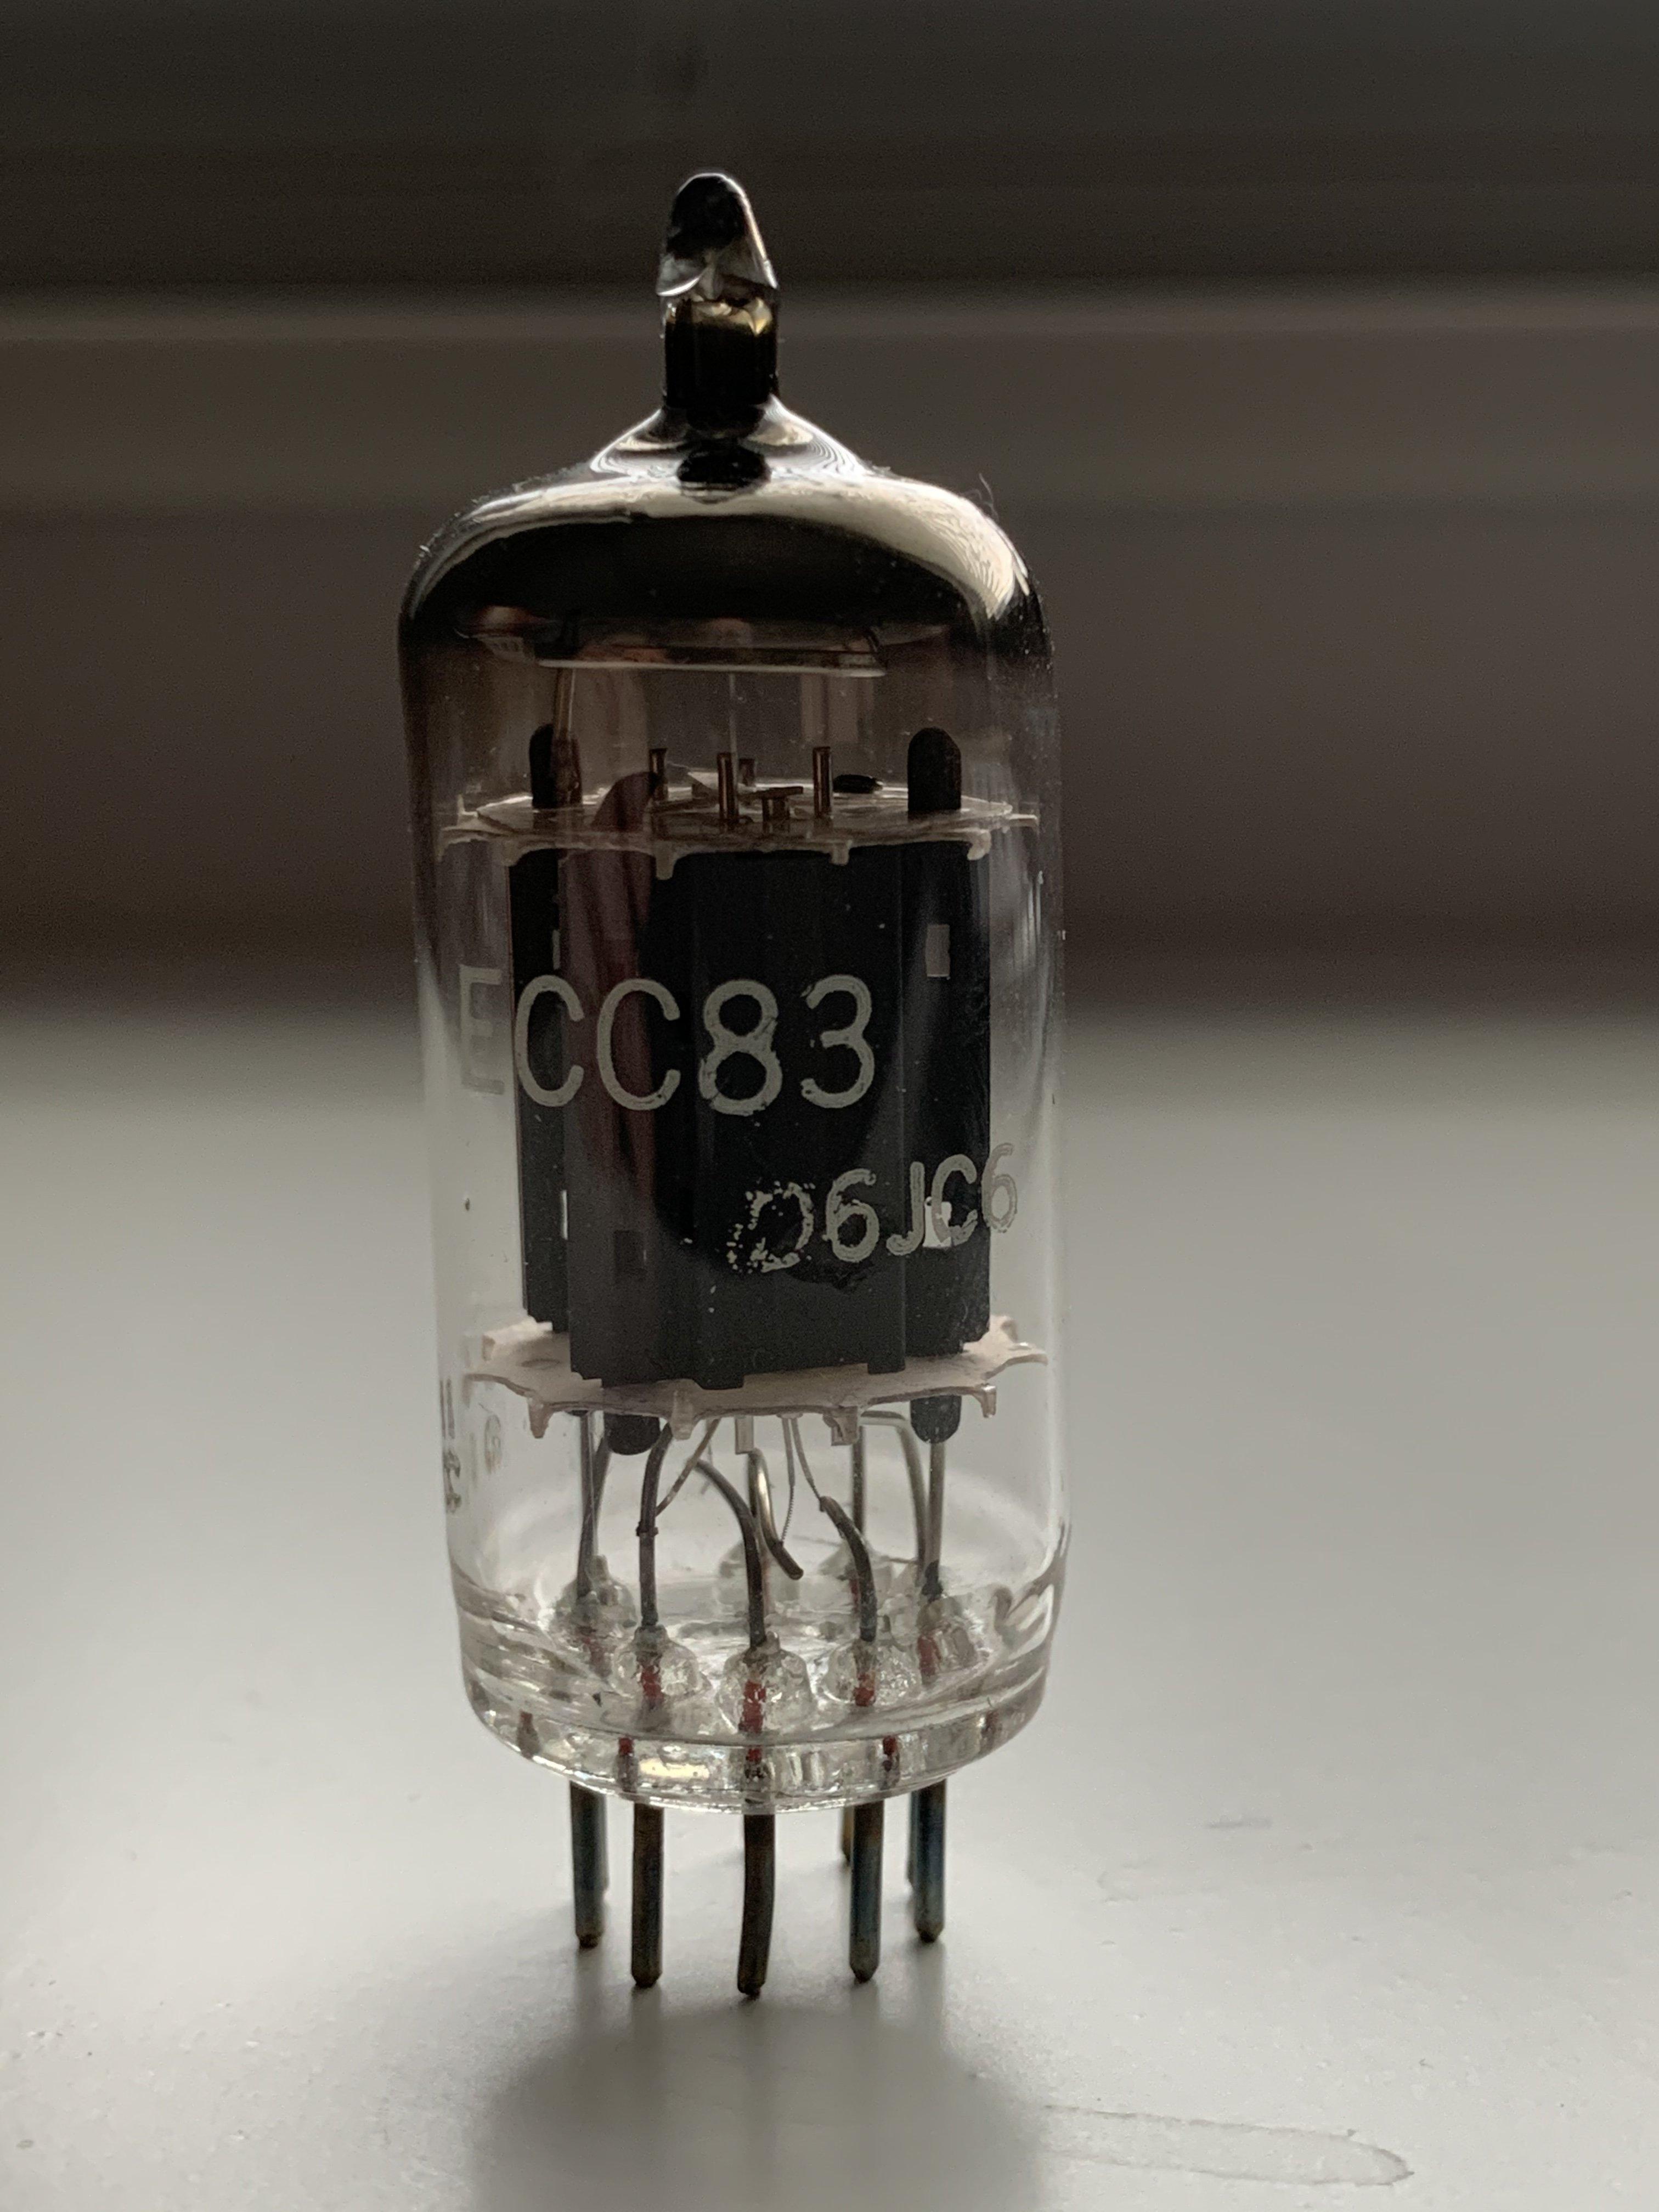 10835C18-2FE0-4727-928A-F7E2B7BBDE7E.jpeg